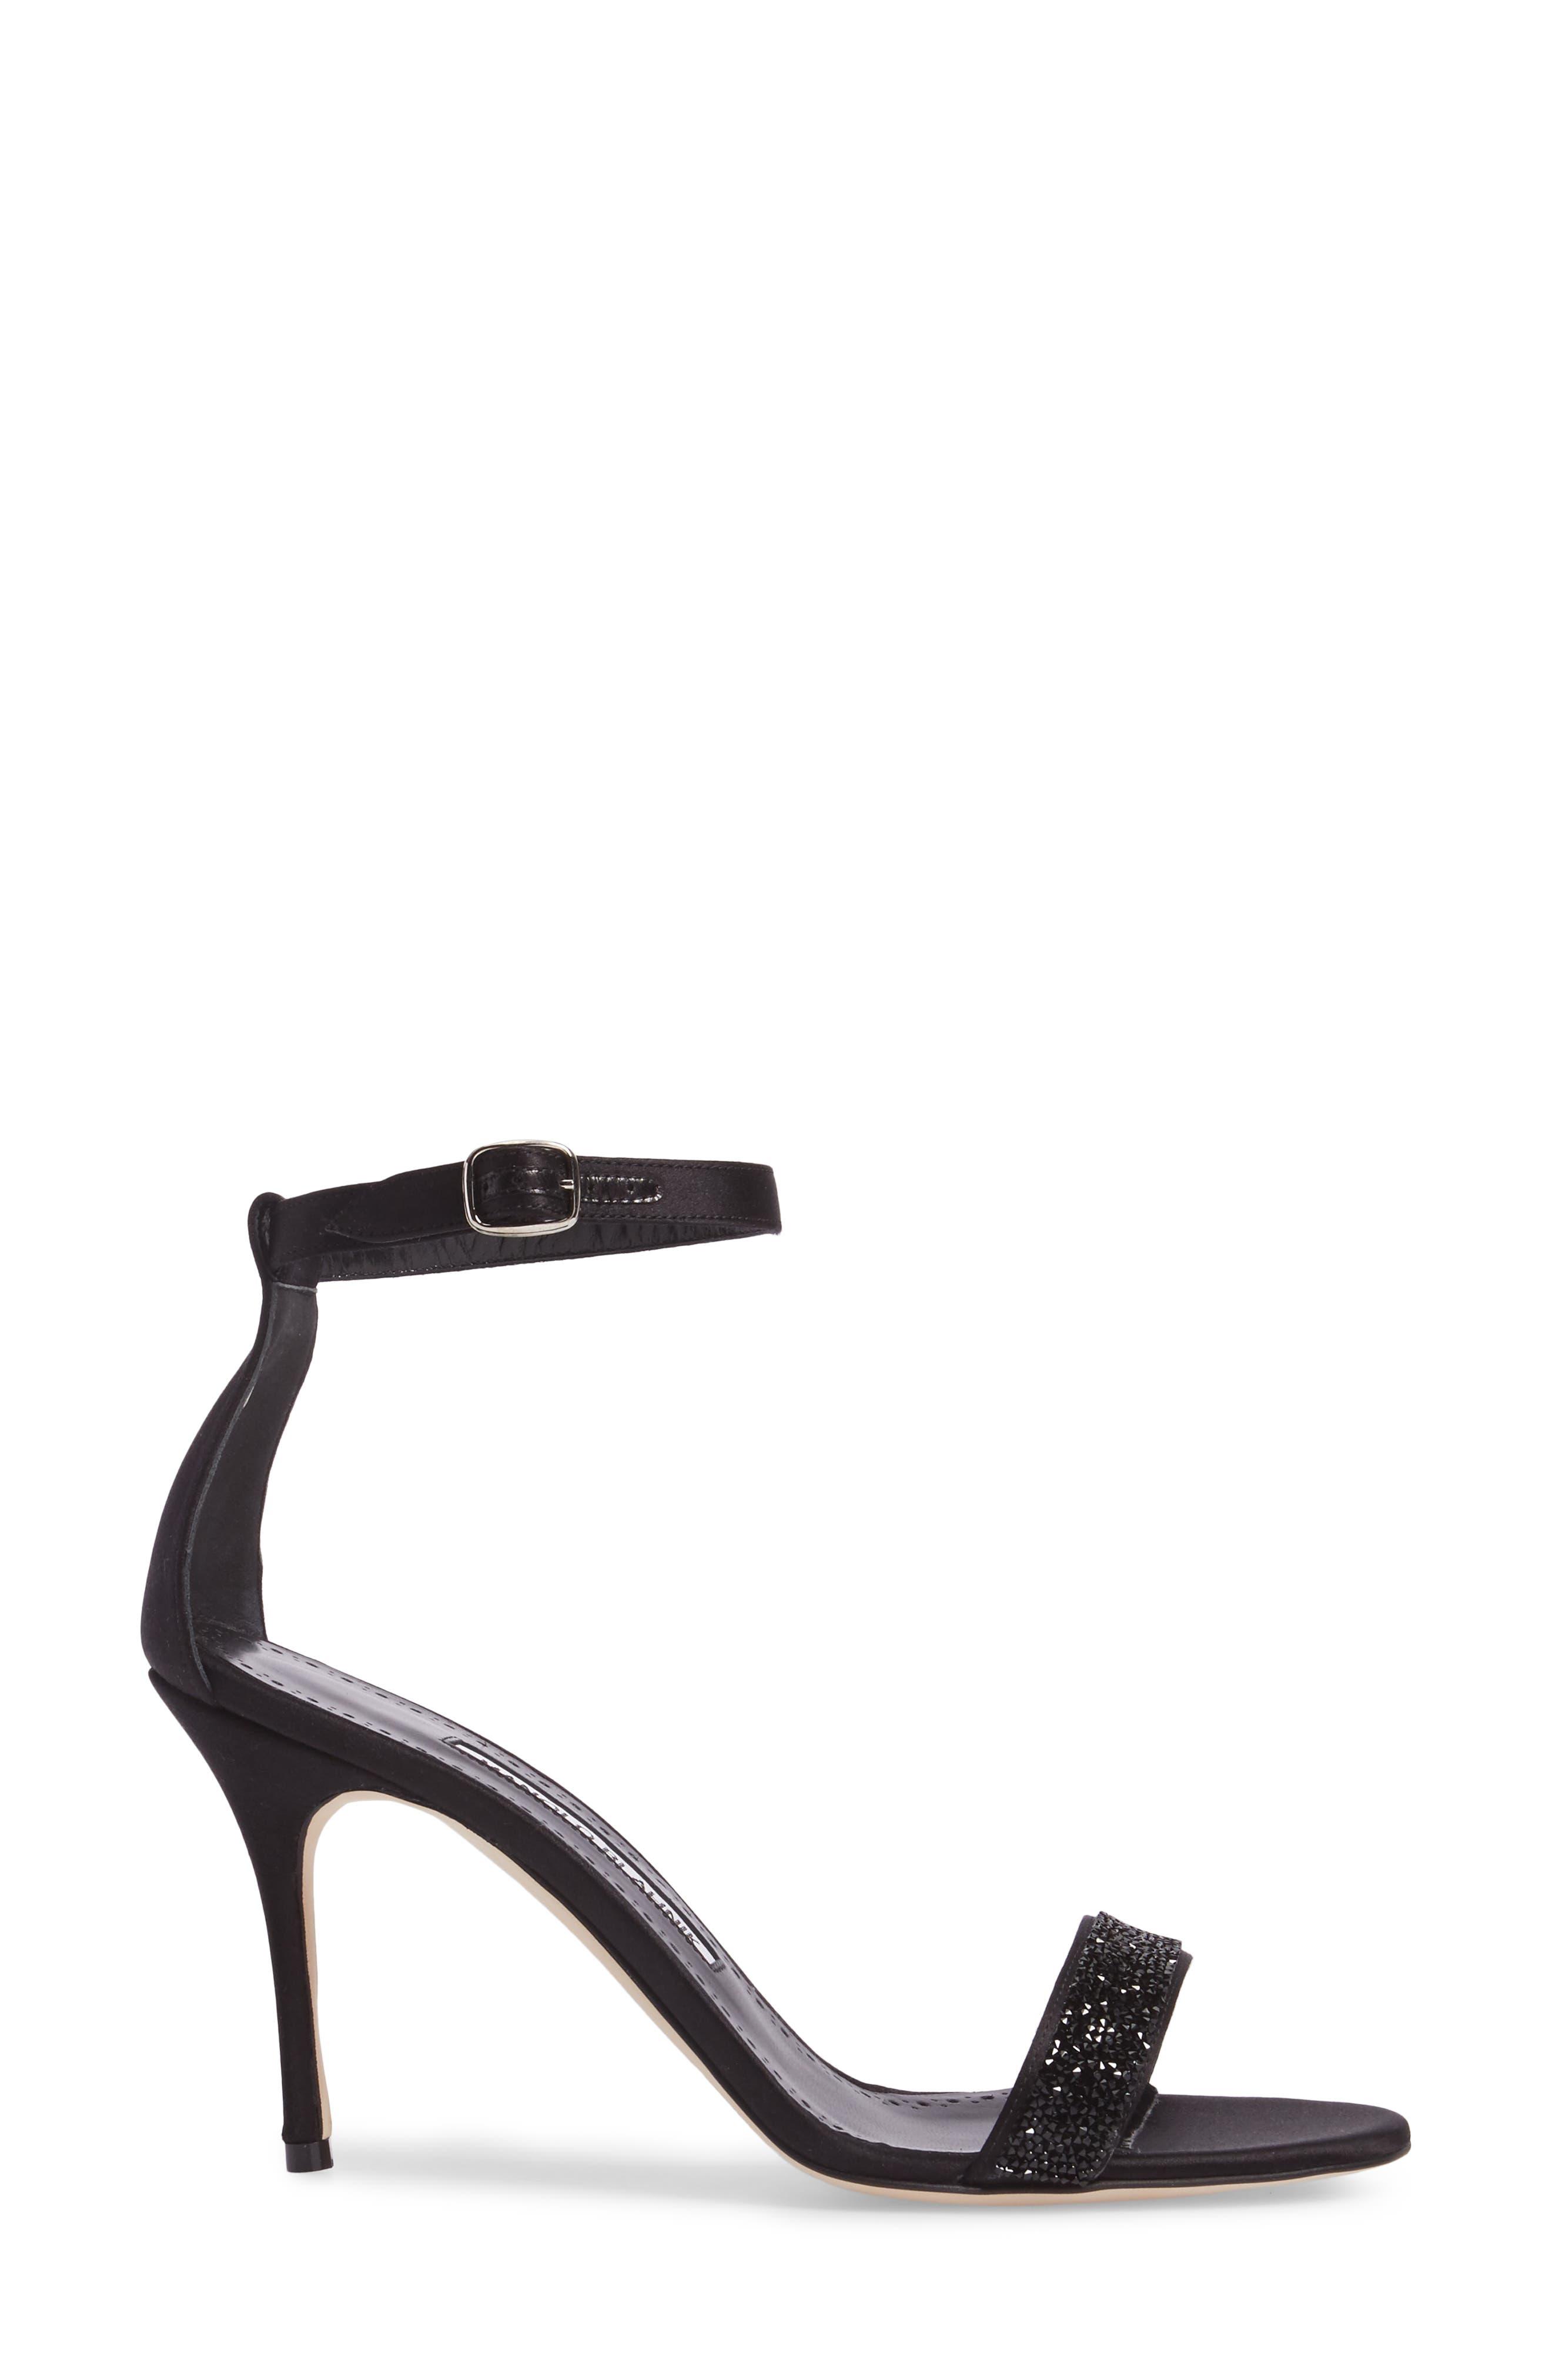 Chaos Ankle Strap Sandal,                             Alternate thumbnail 3, color,                             Black